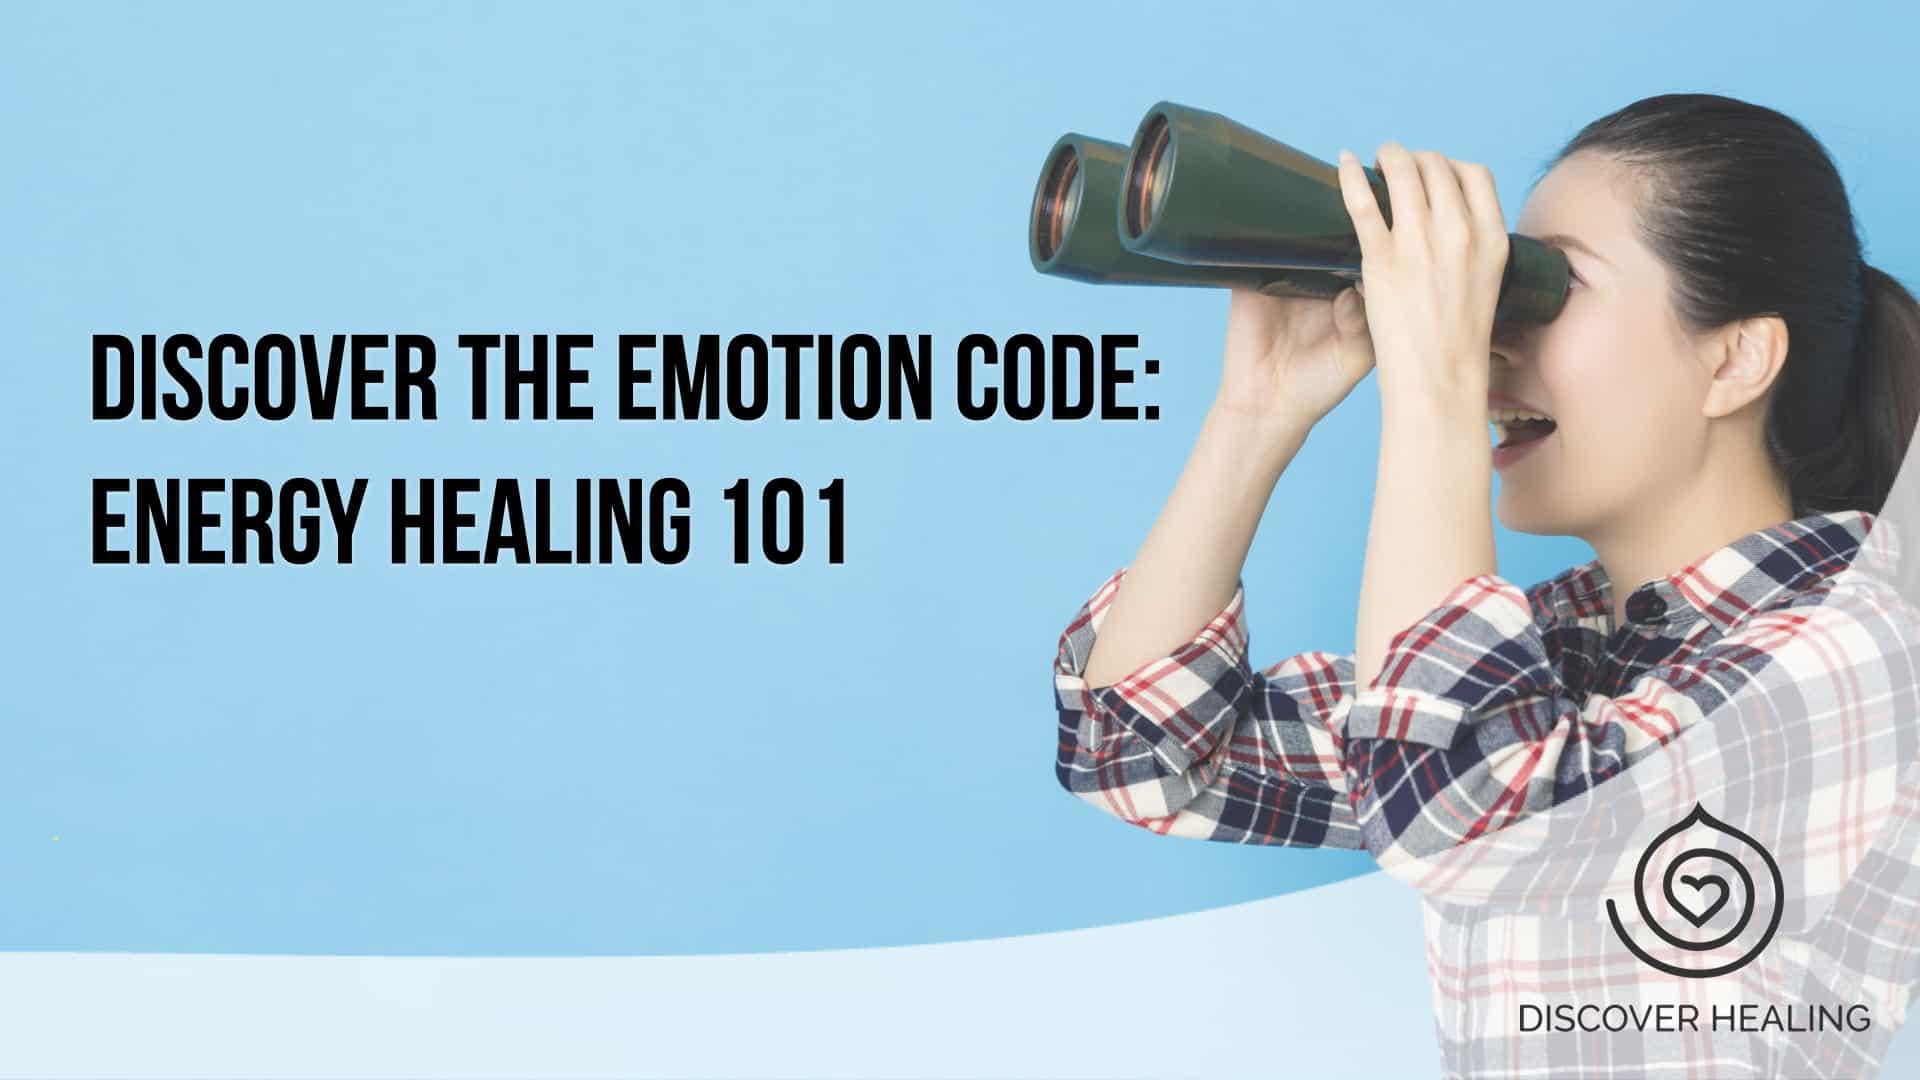 WEBINAR | Discover The Emotion Code: Energy Healing 101